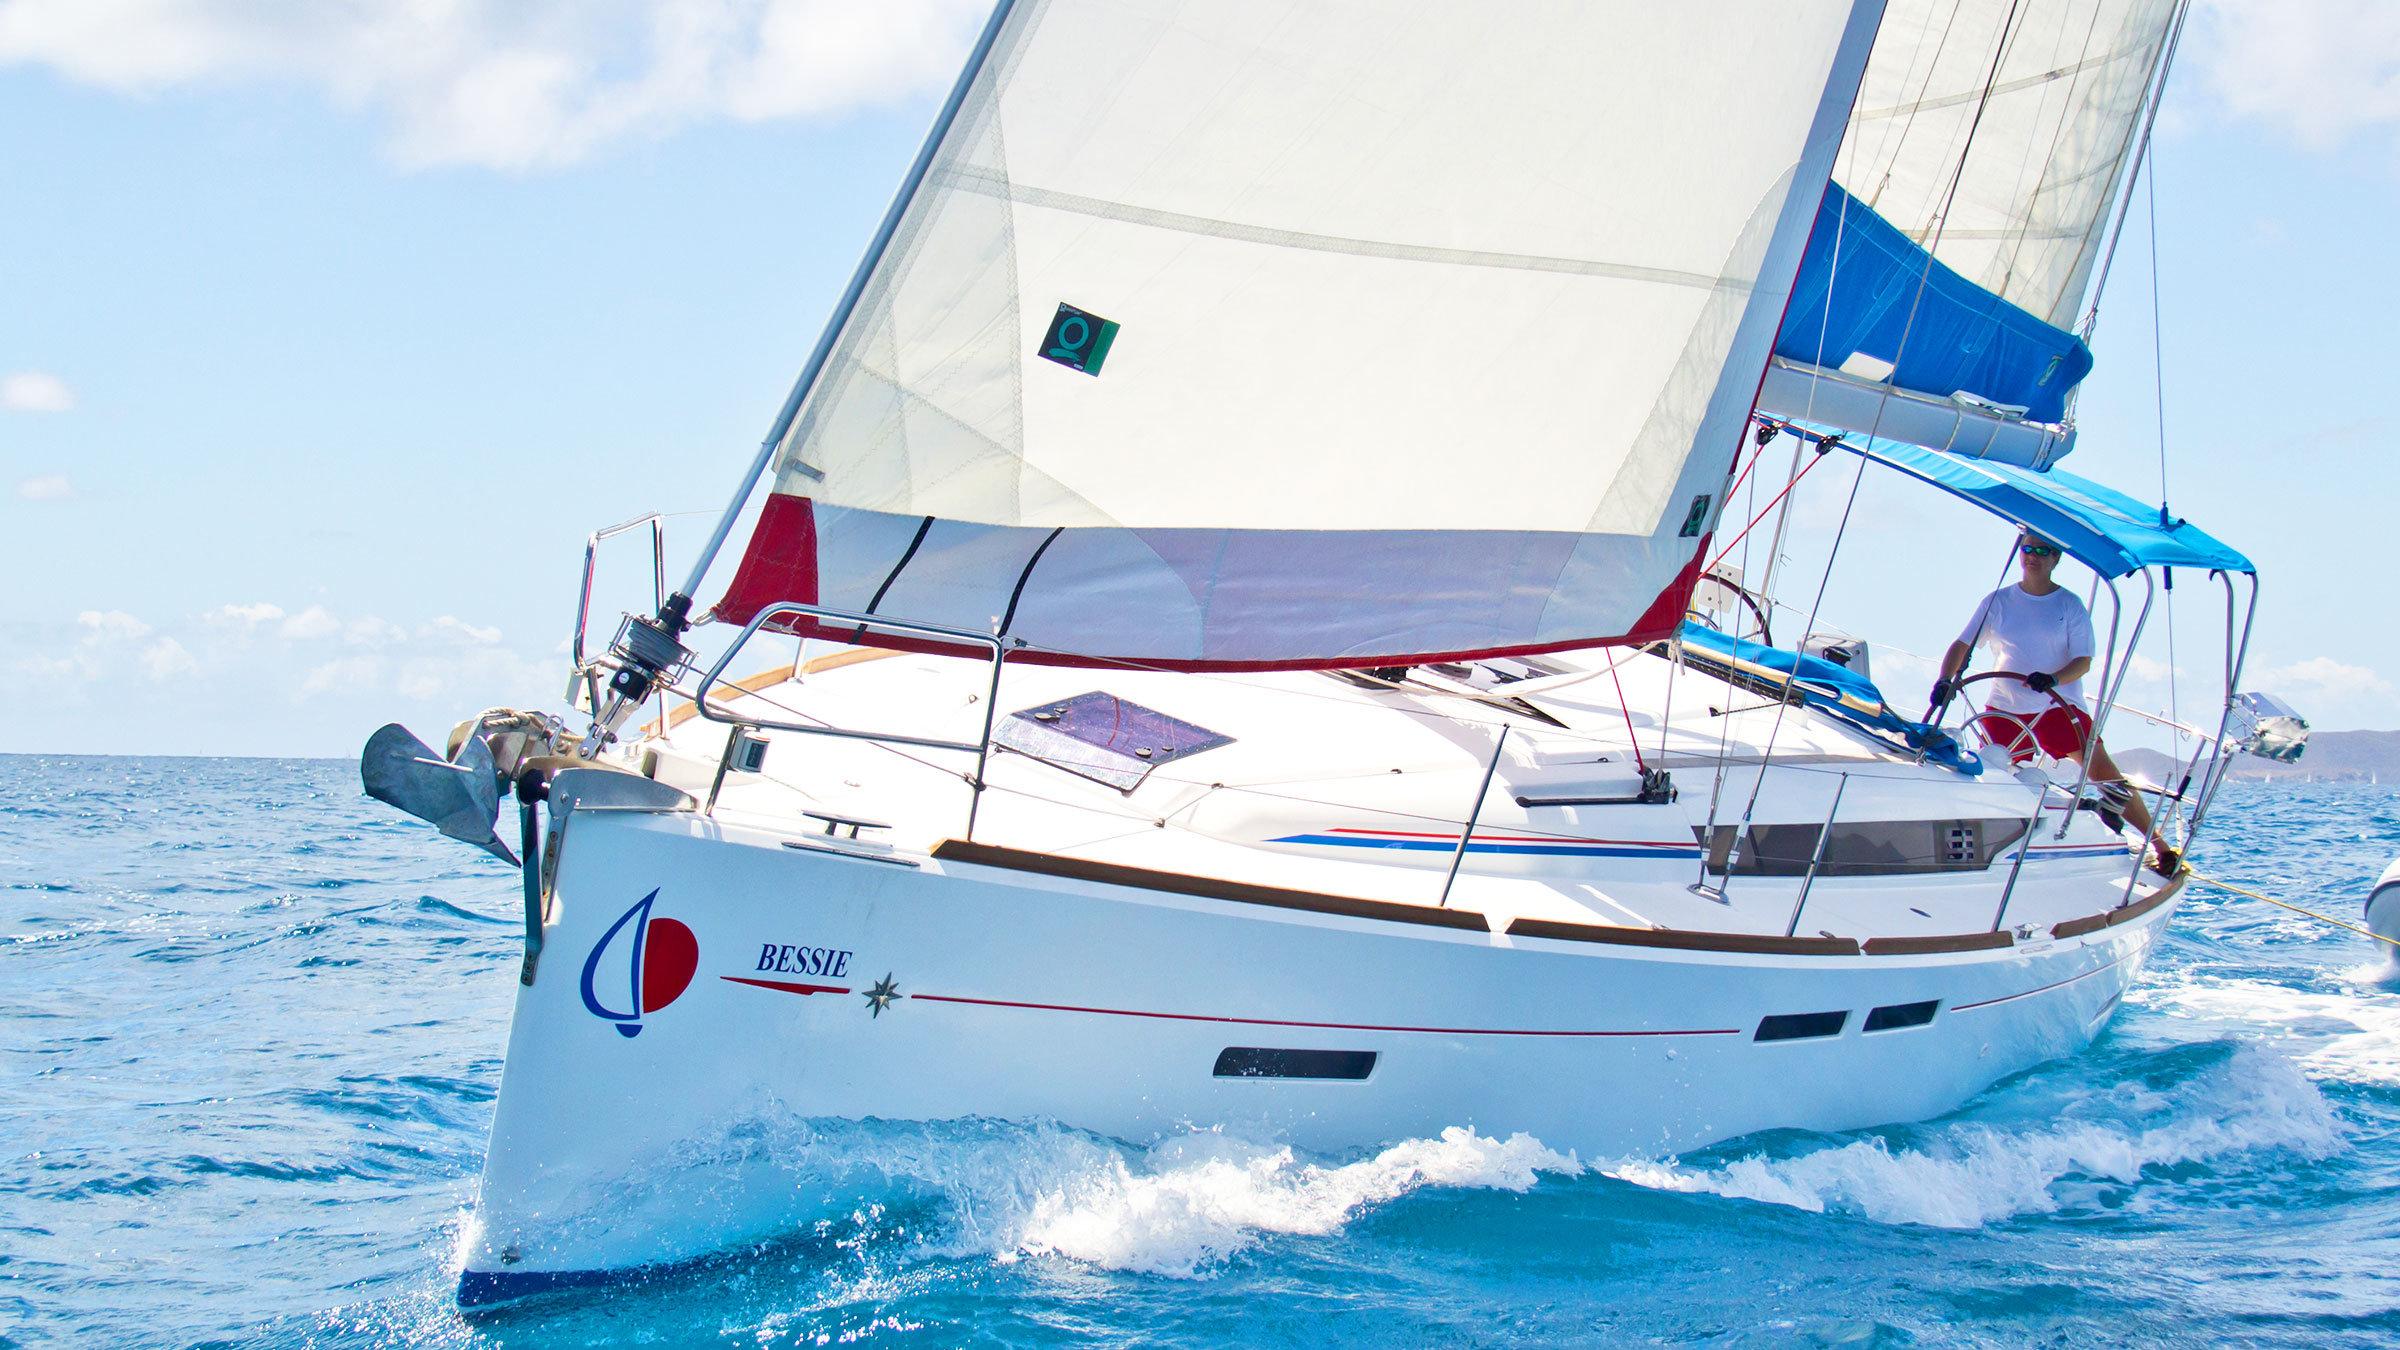 41 ft Sunsail monohull in the British Virgin Islands